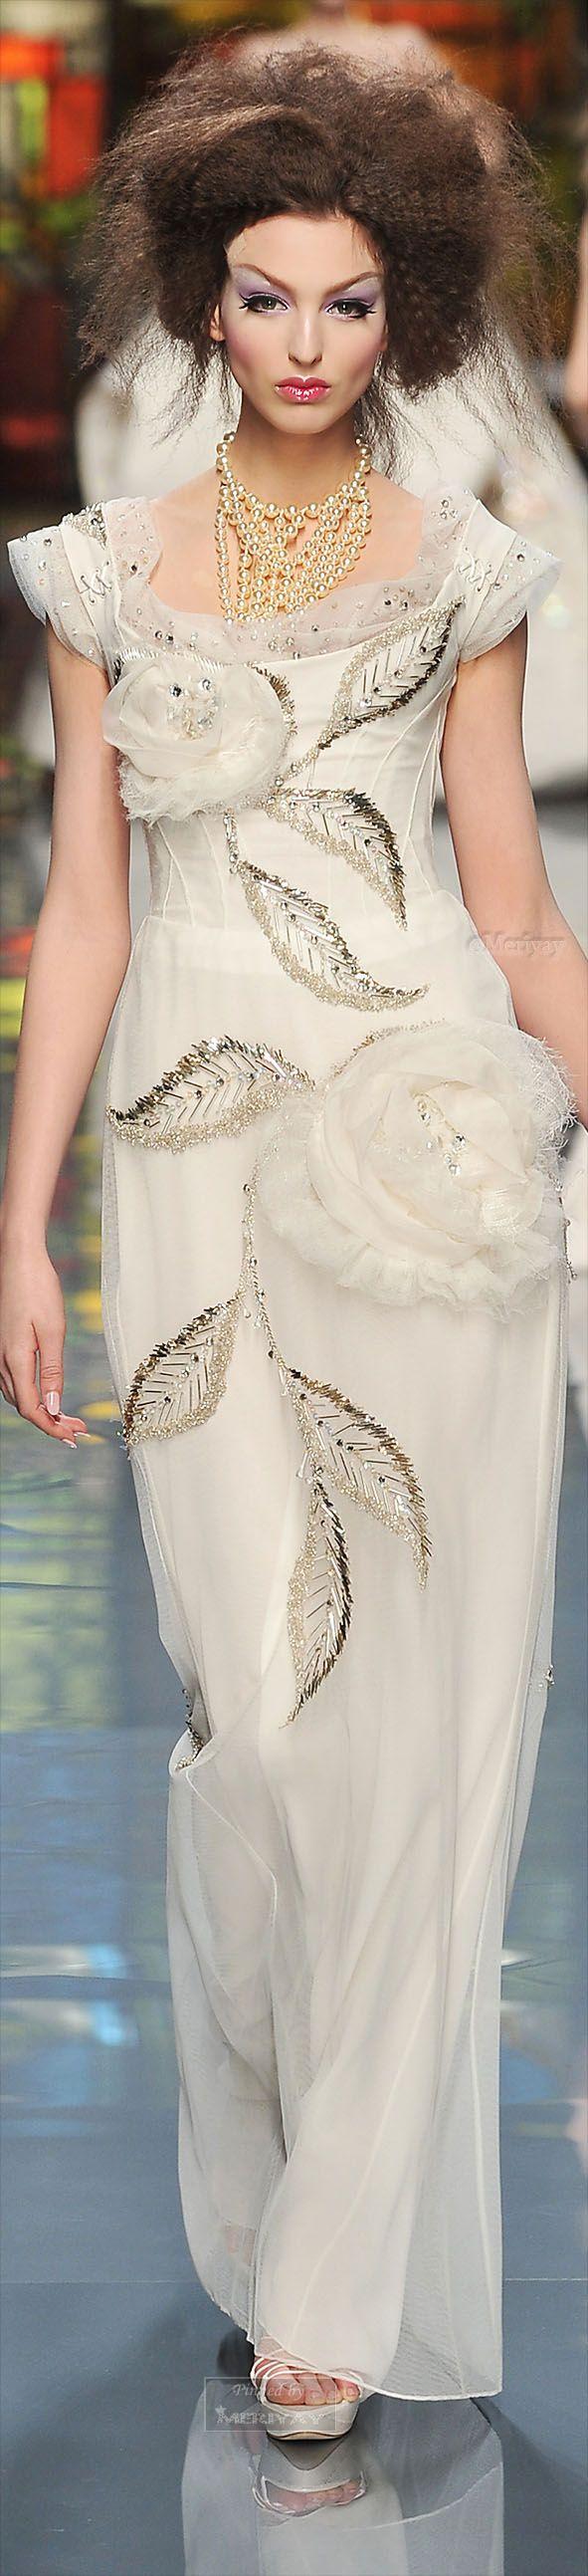 ~Christian Dior   House of Beccaria